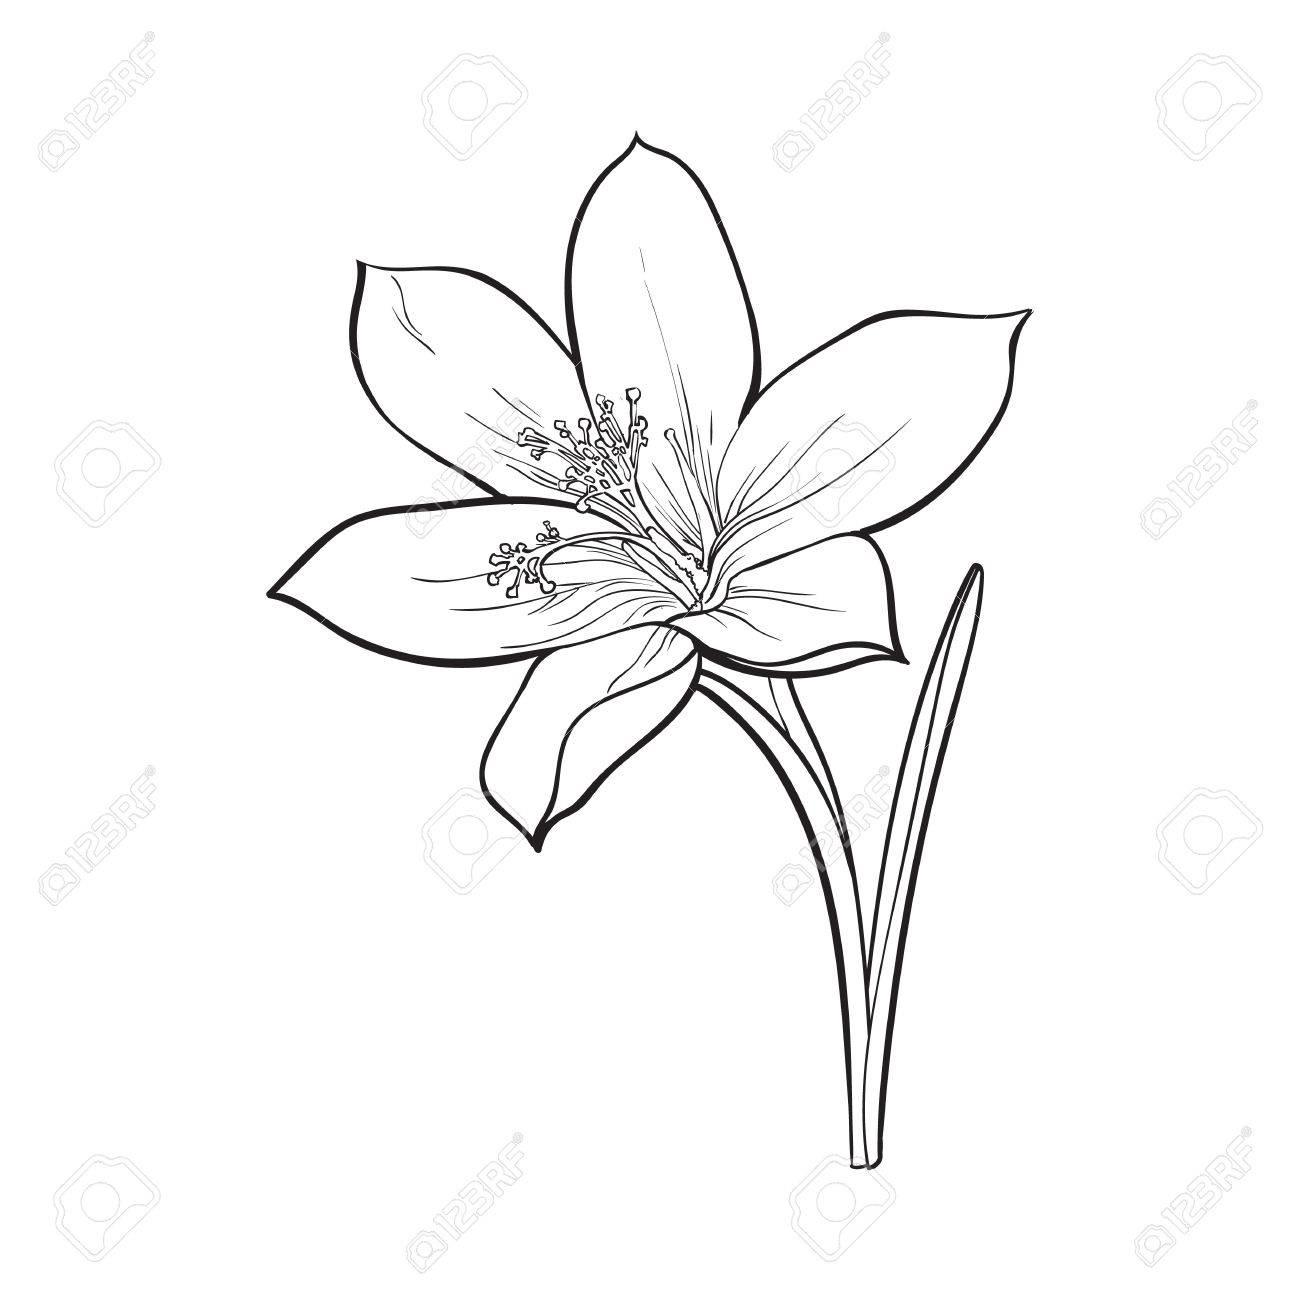 Delicate Single Crocus Spring Flower With Stem And Leaf Sketch